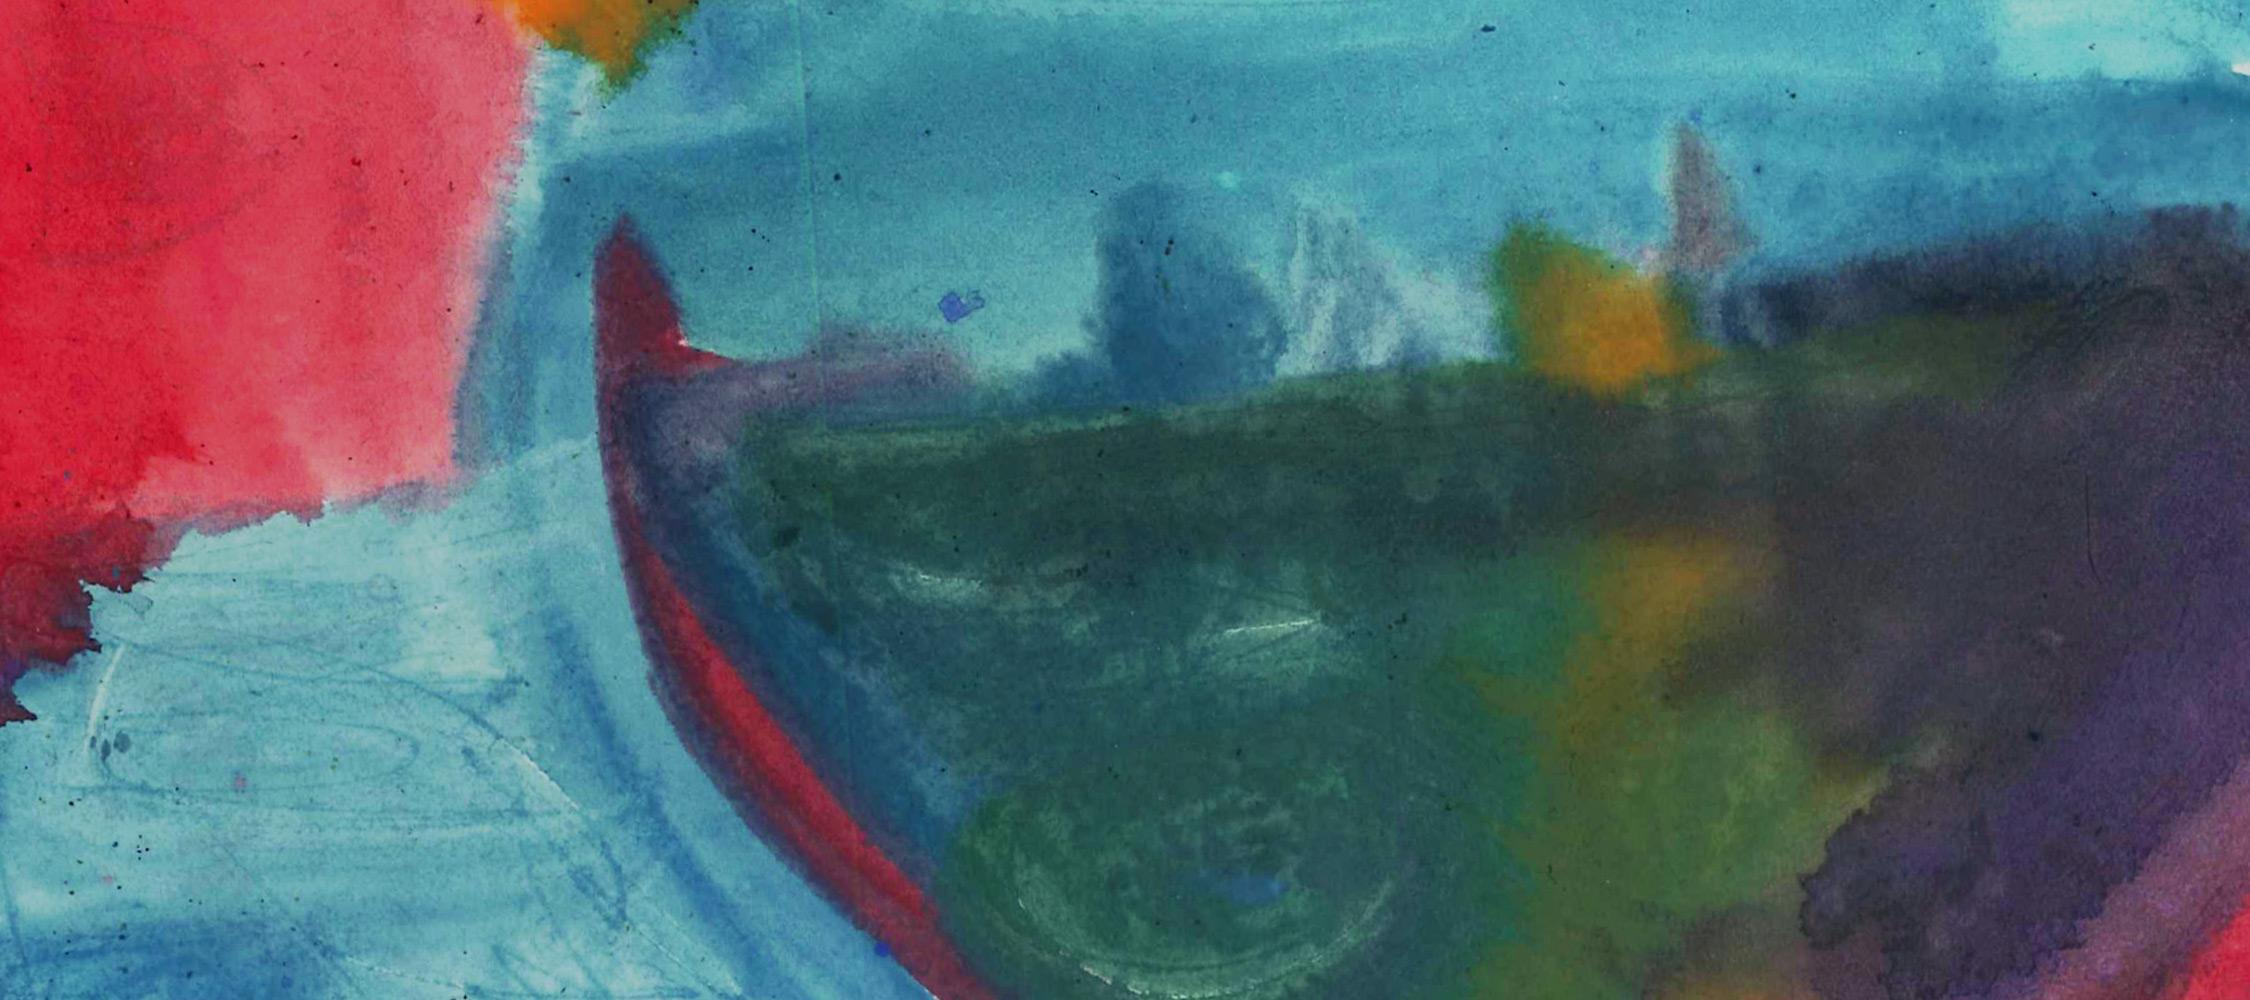 franz-haas-sofi-background